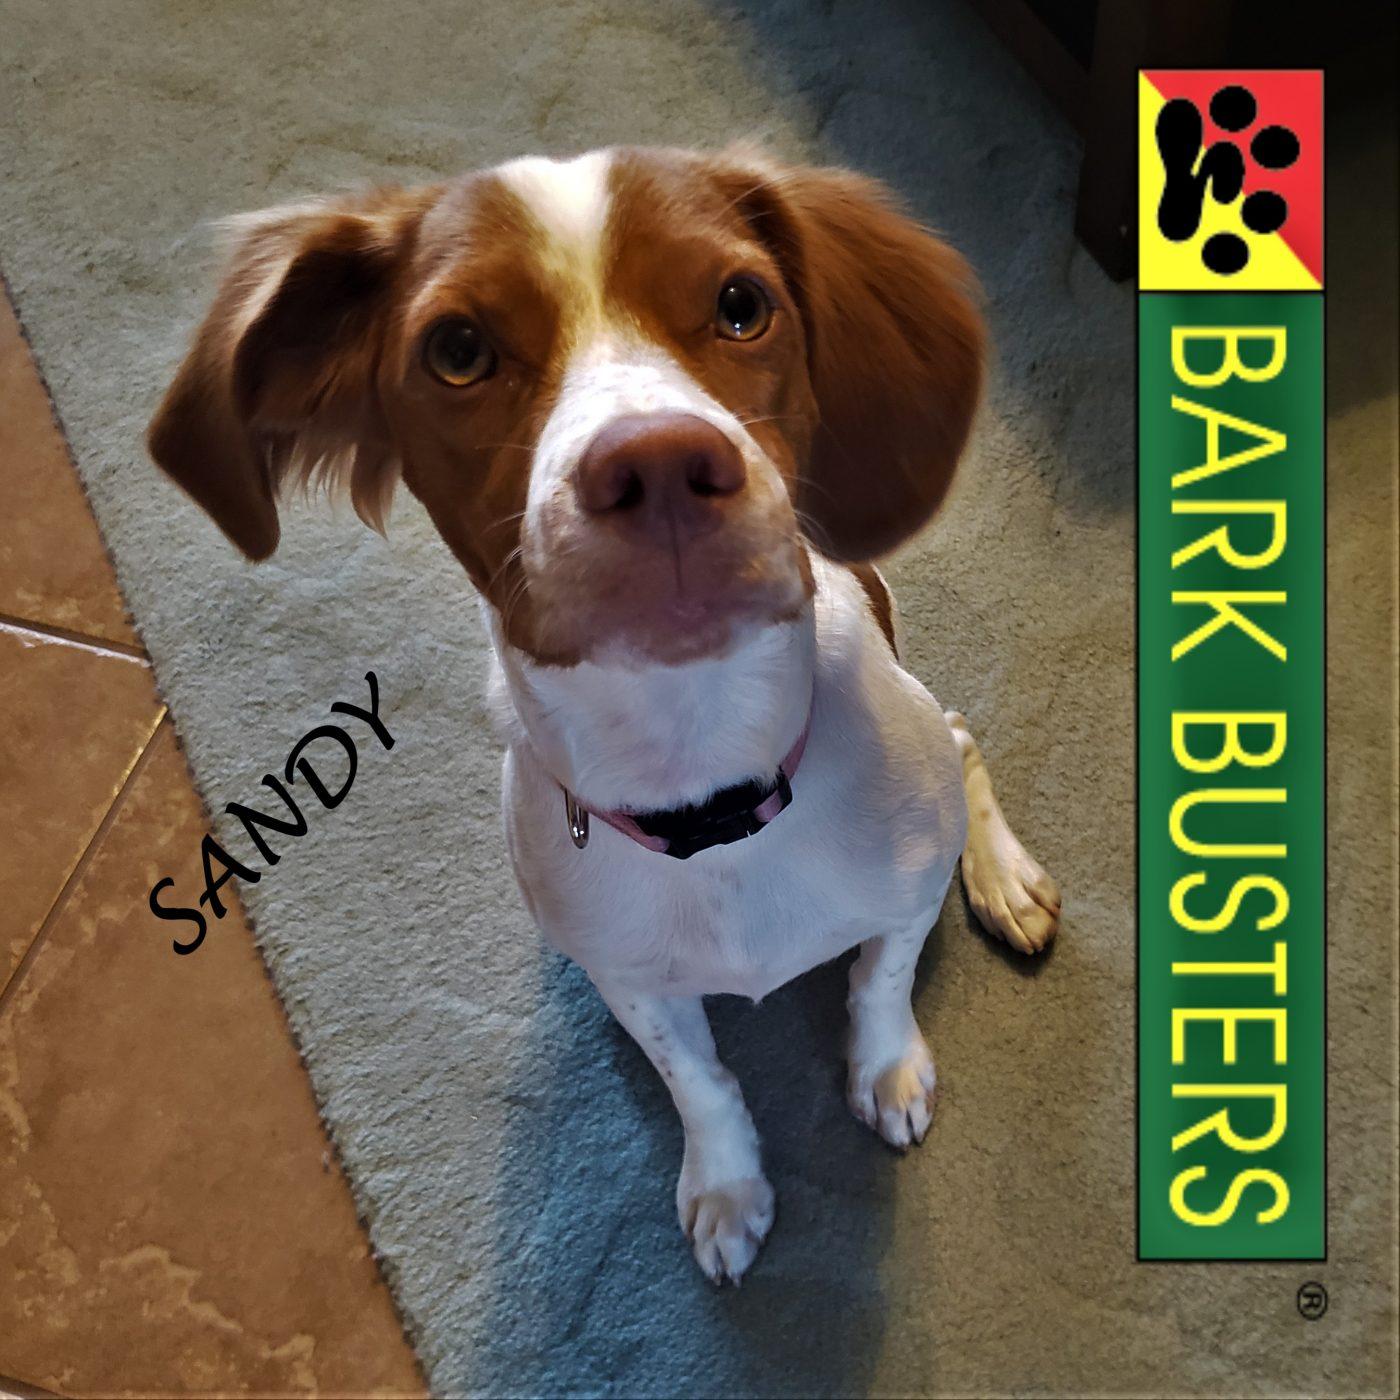 #puppytraining #dogtrainingroundrock #dogtrainernearme #barkbusters